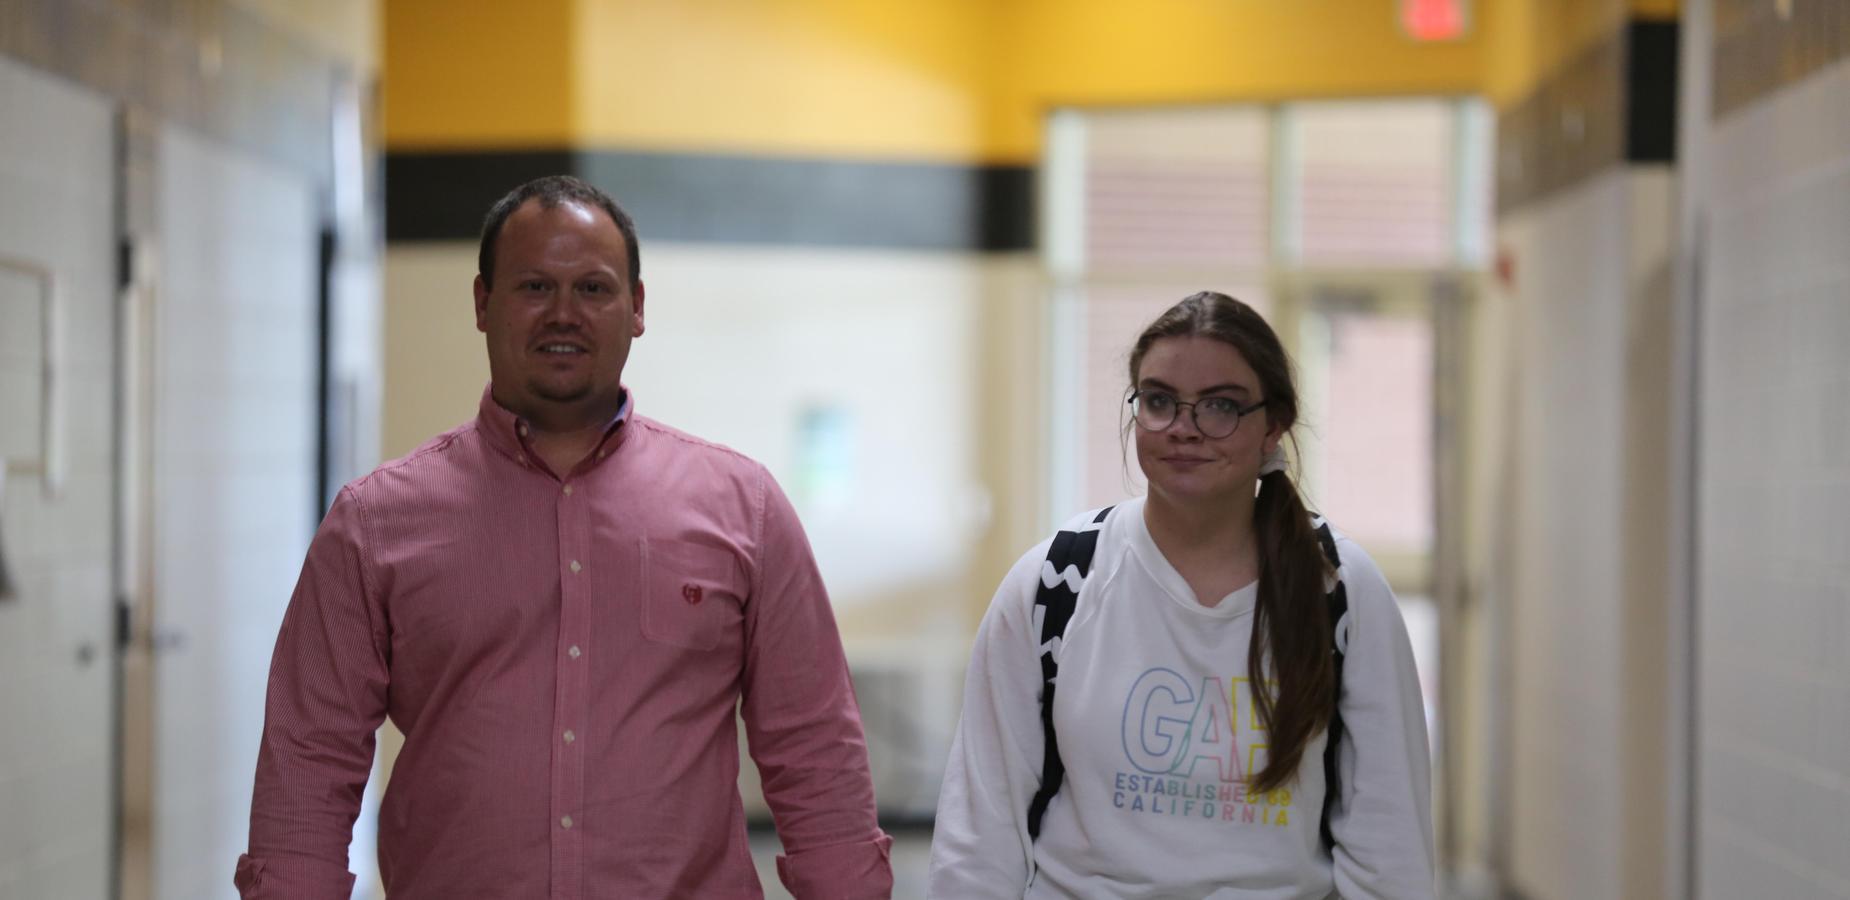 Sams & Student